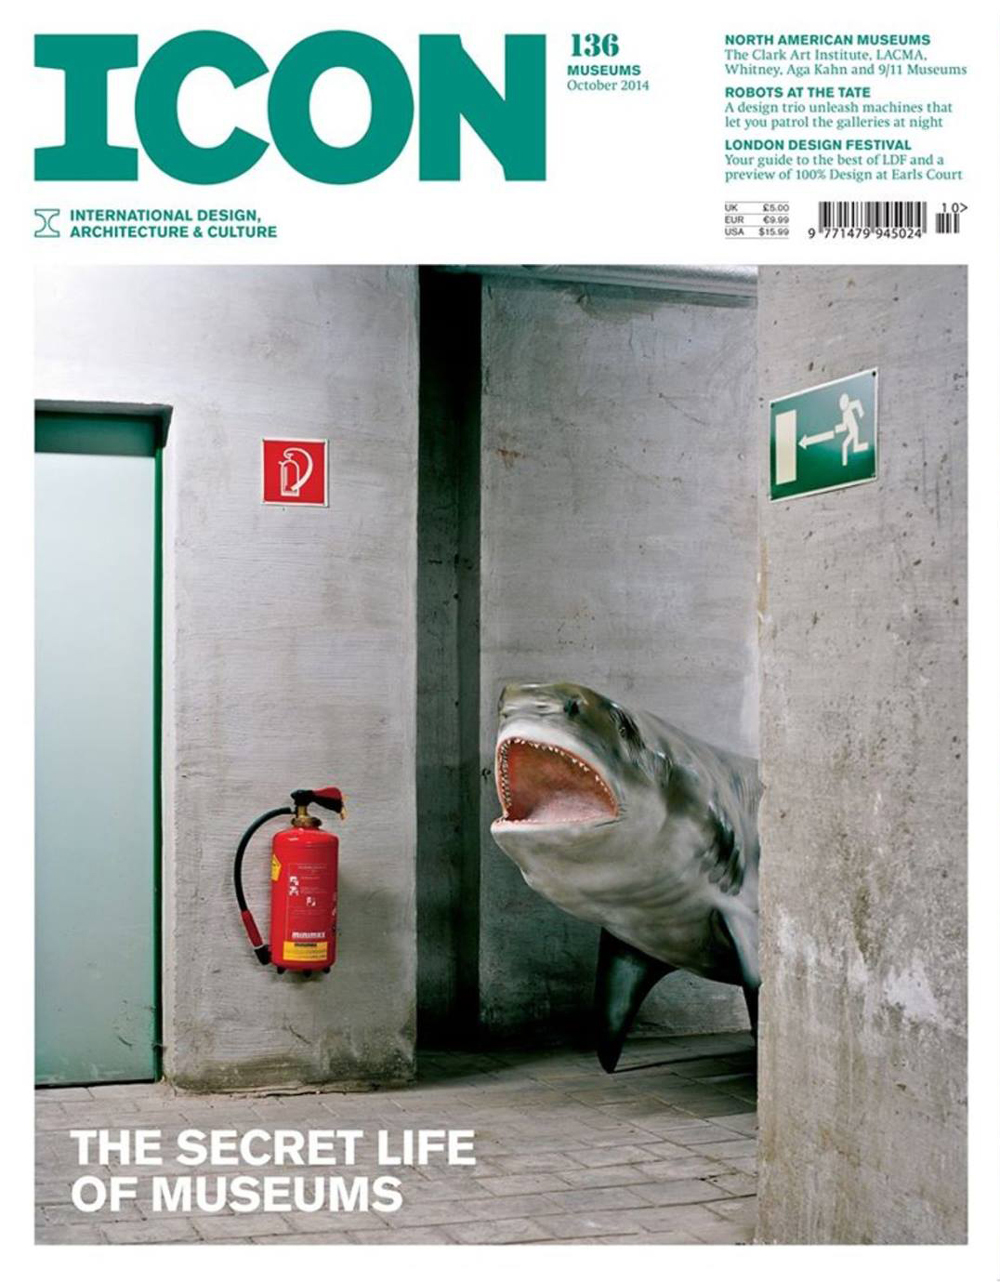 Icon_pub_Mister_1014_COVER.jpg